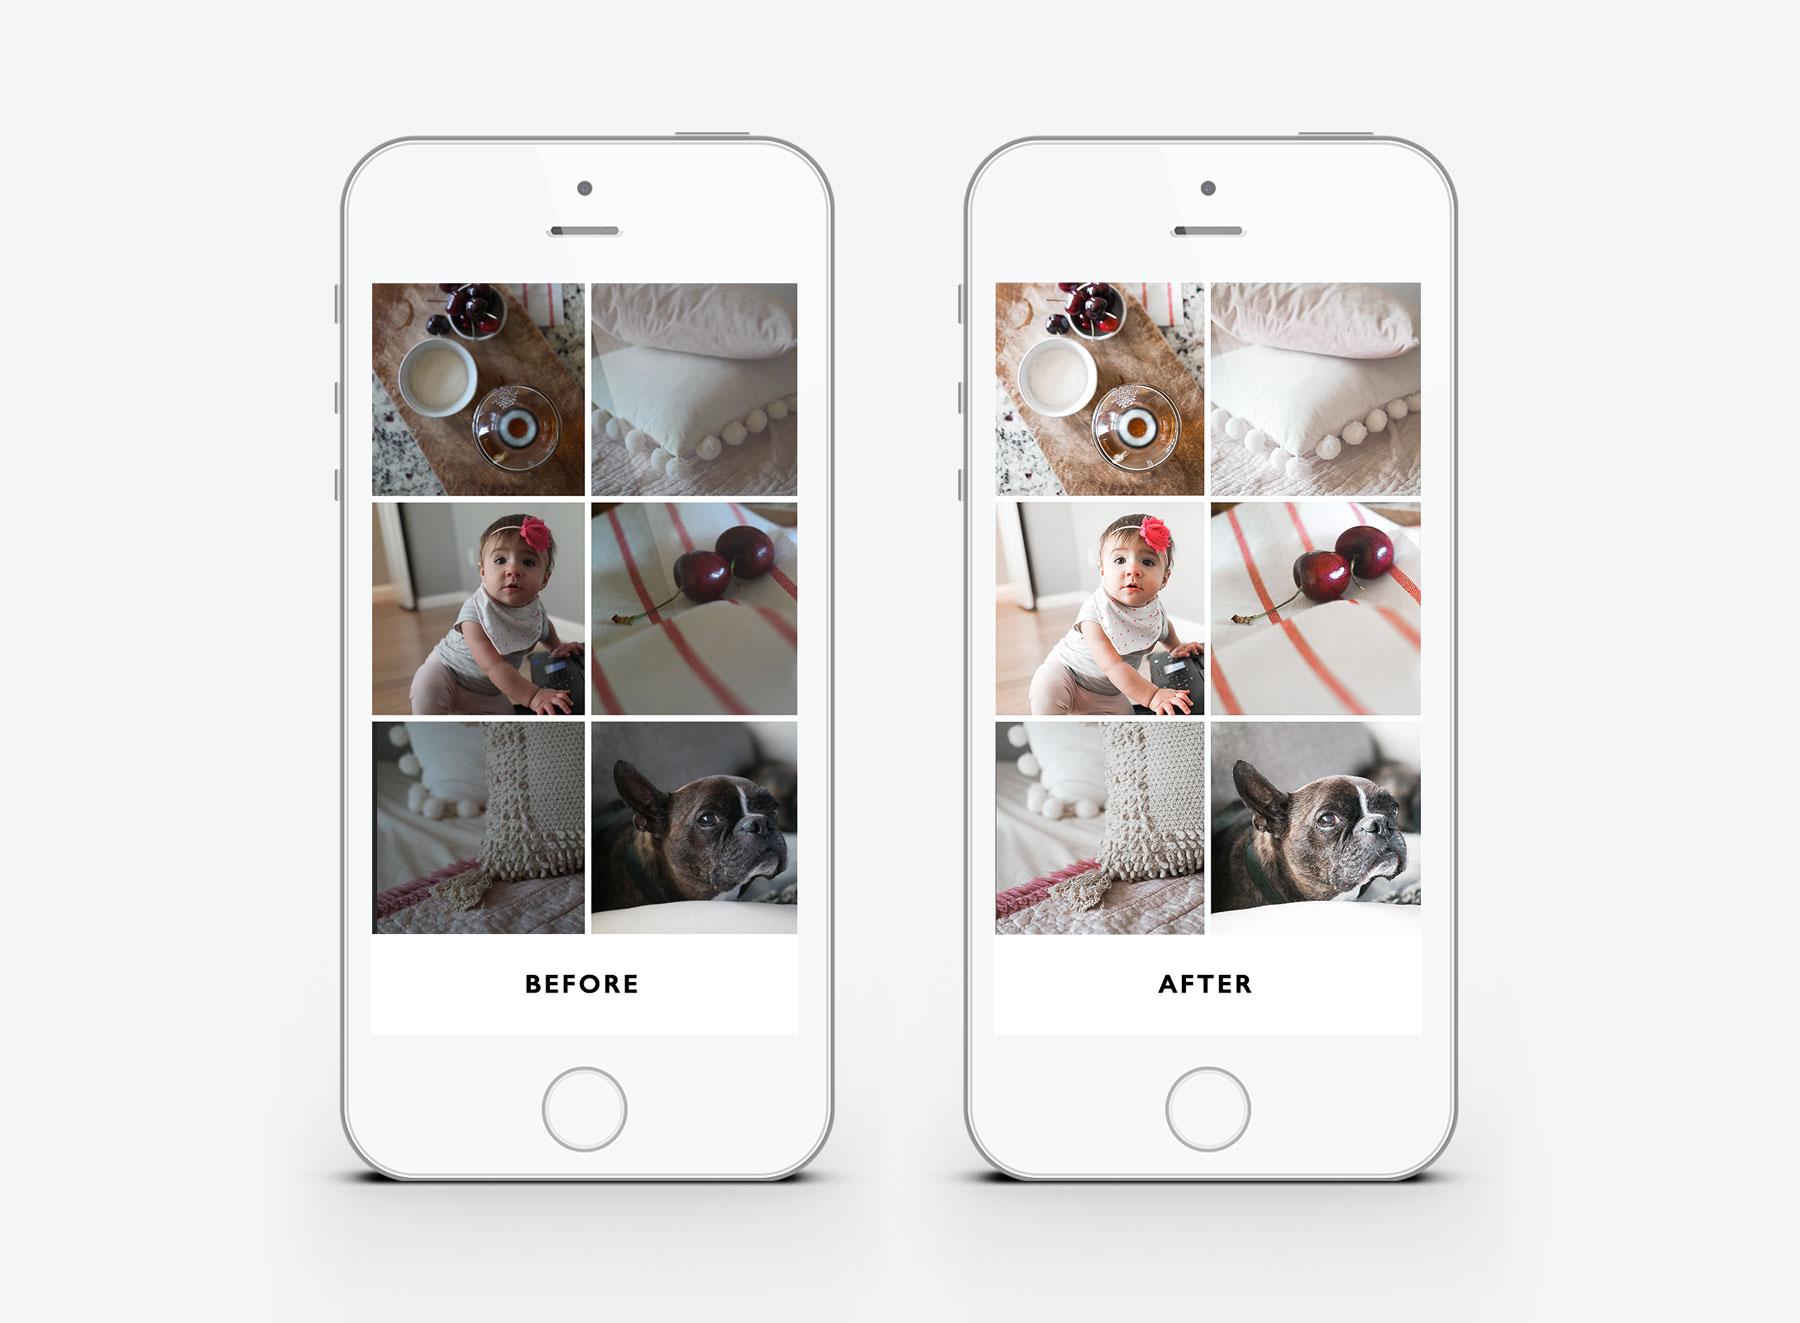 presets for lightroom mobile & photoshop lightroom cc desktop | presets for photographers, bloggers, and graphic designers